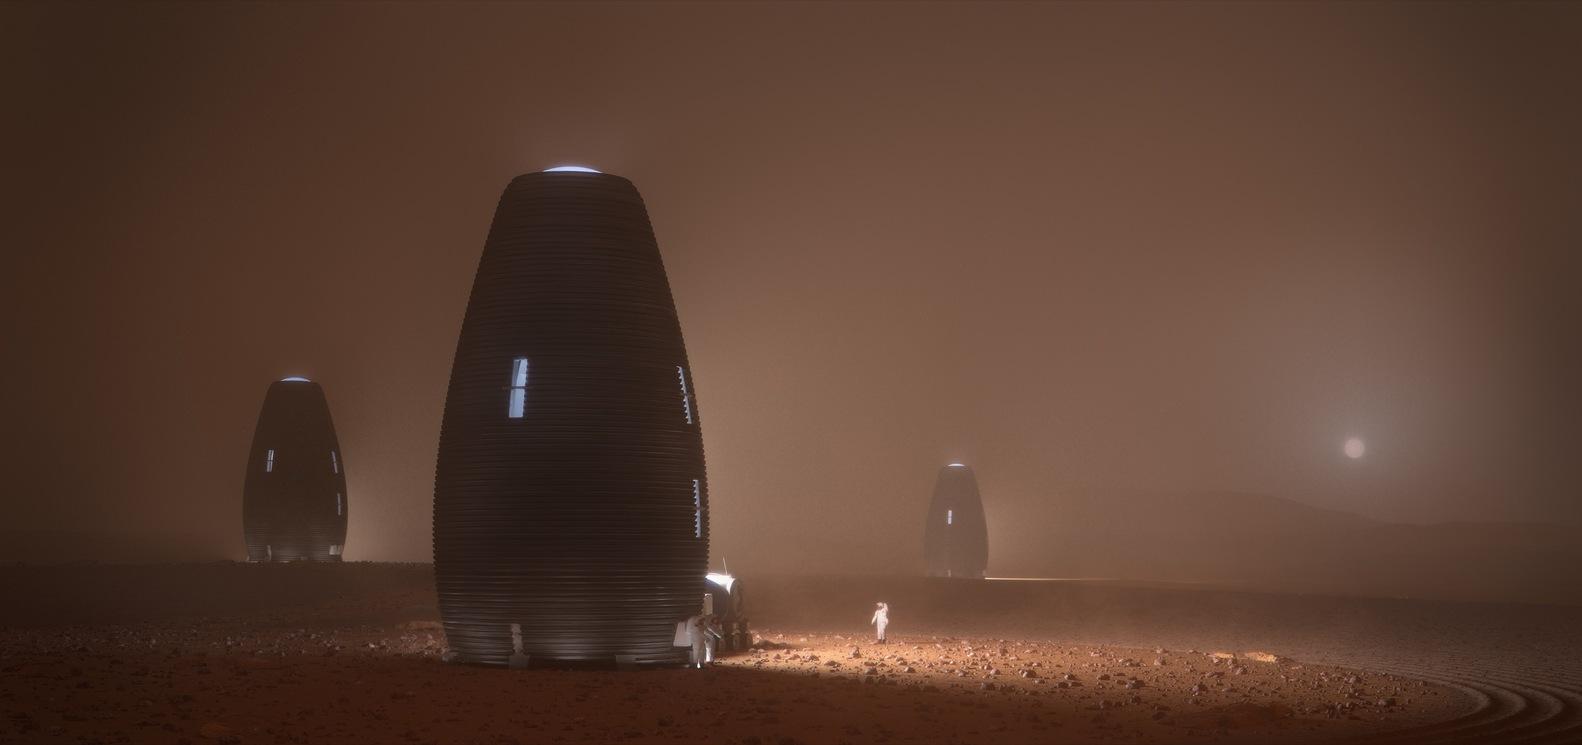 Cápsulas impresas en 3D para astronautas en Marte